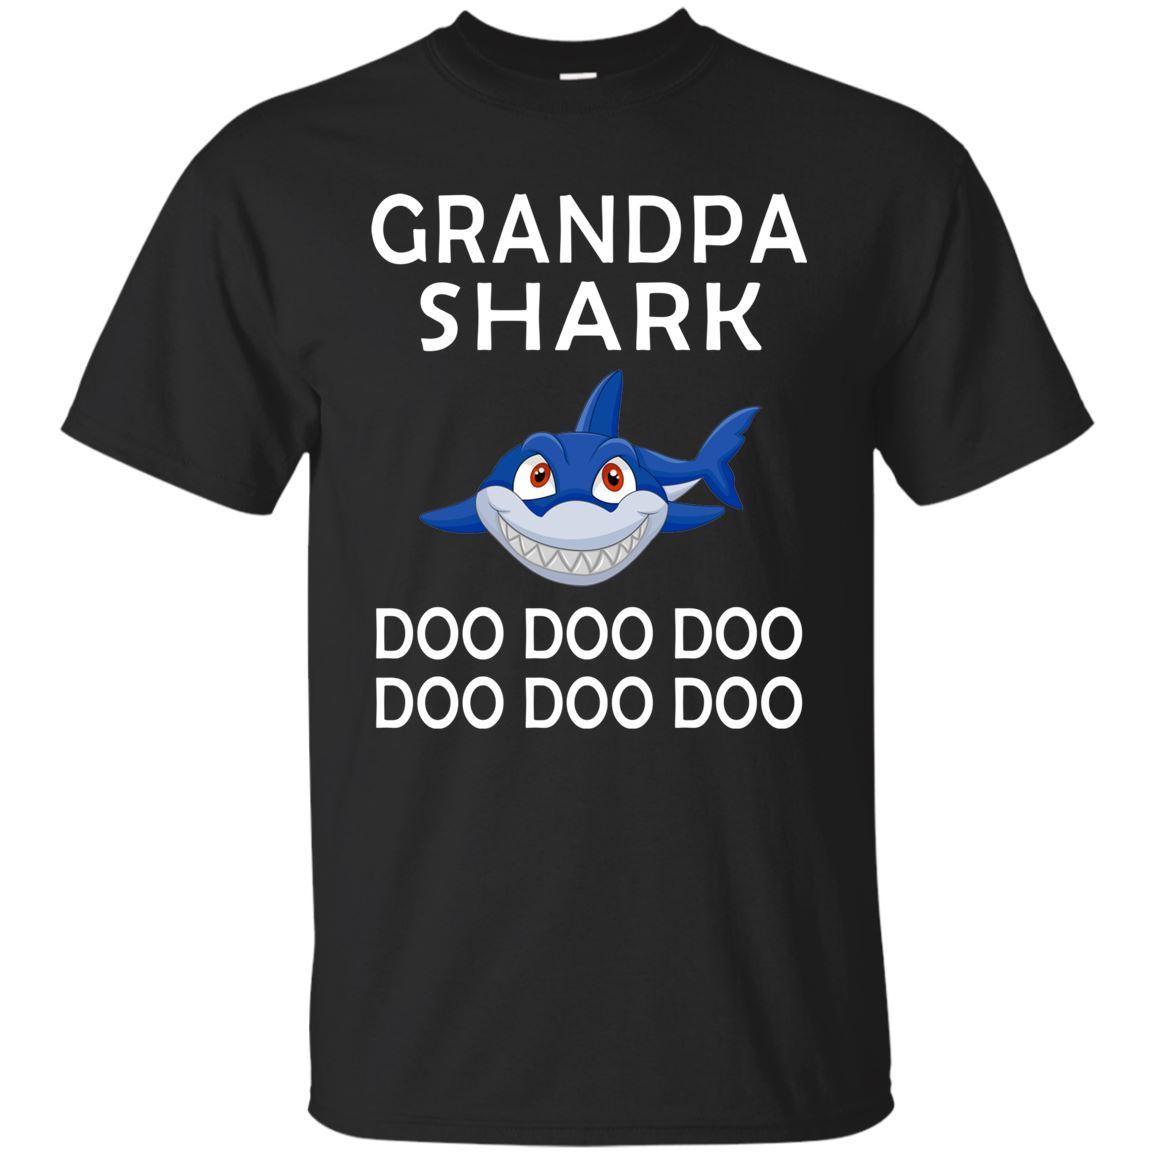 Grandpa Shark T-shirt Doo - Father's Day Shirts Black Navy Tee  Cartoon t shirt